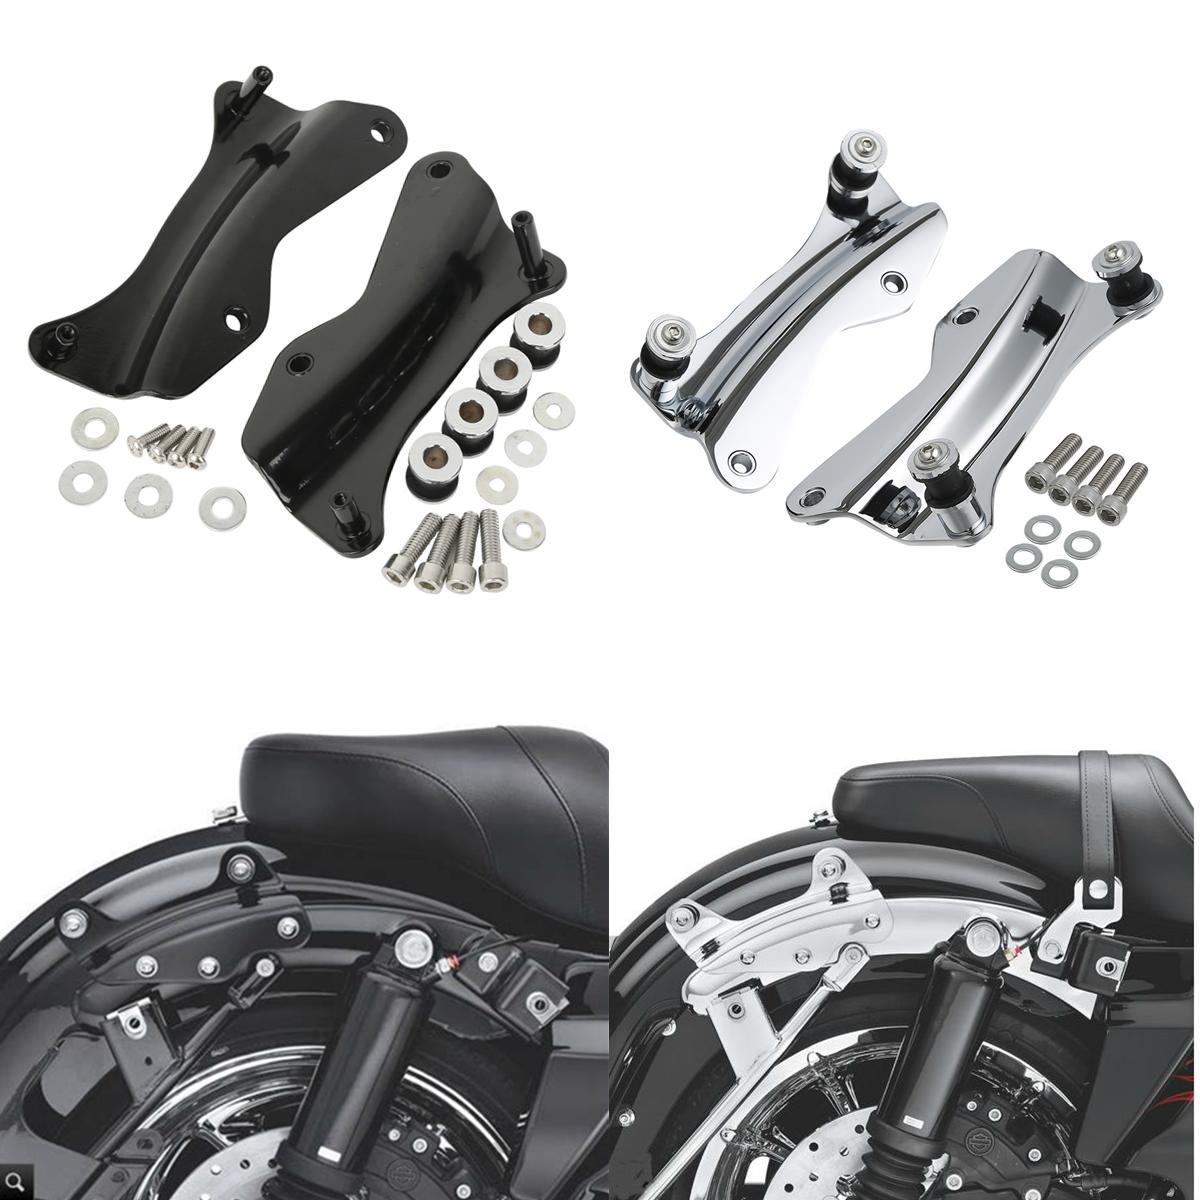 Kit de accesorios de acoplamiento de 4 puntos para motocicleta Harley Road King Street Electra Glide 2014-2019 15 16 17 18 negro/cromo